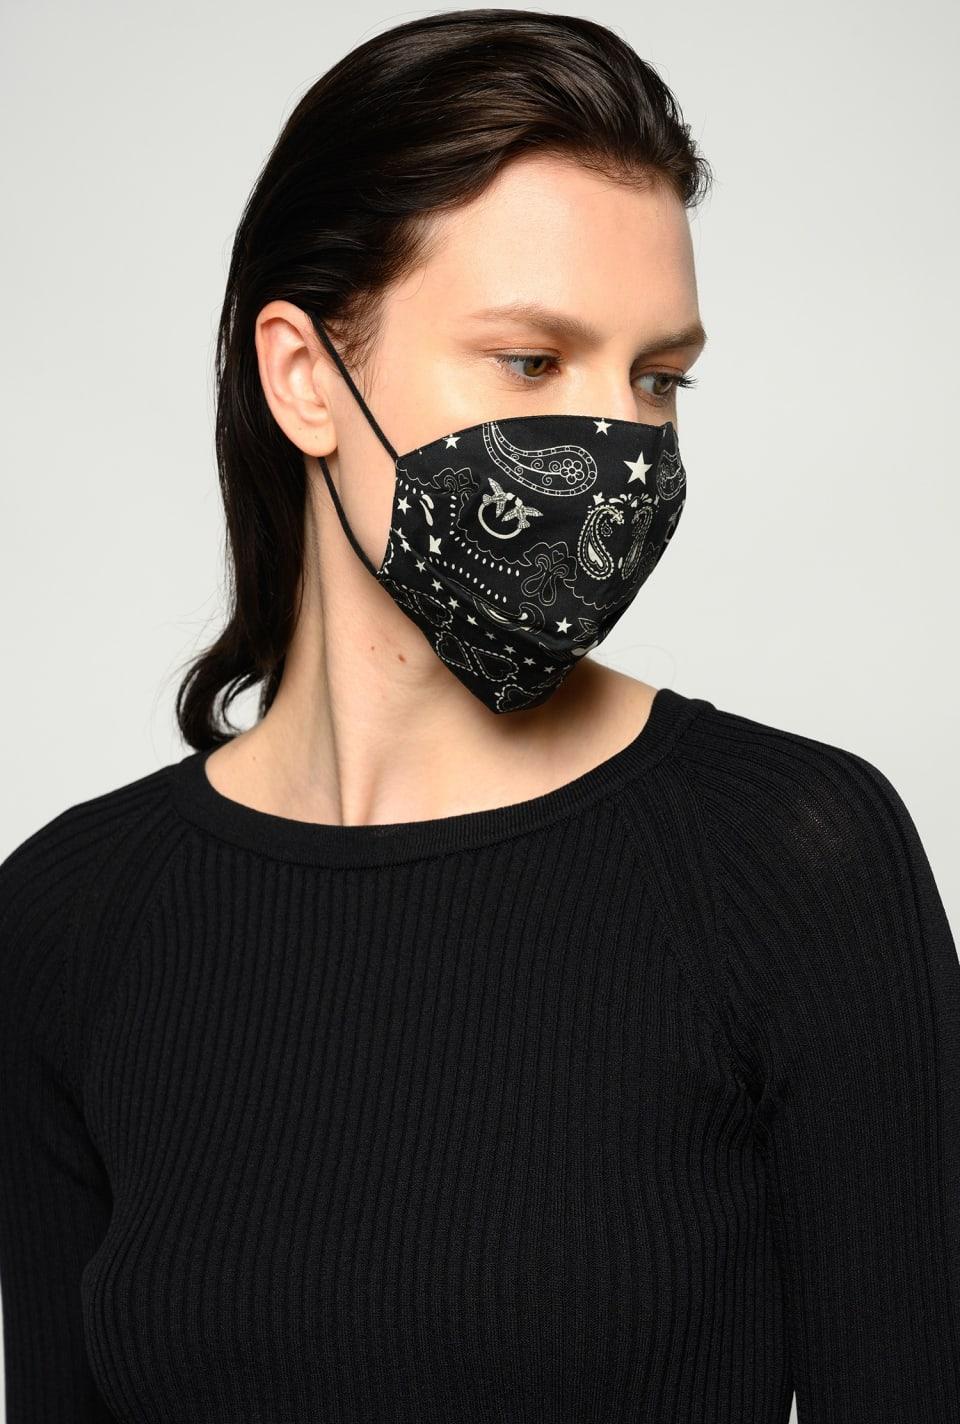 Schutzmaske mit Bandana-Print - Pinko